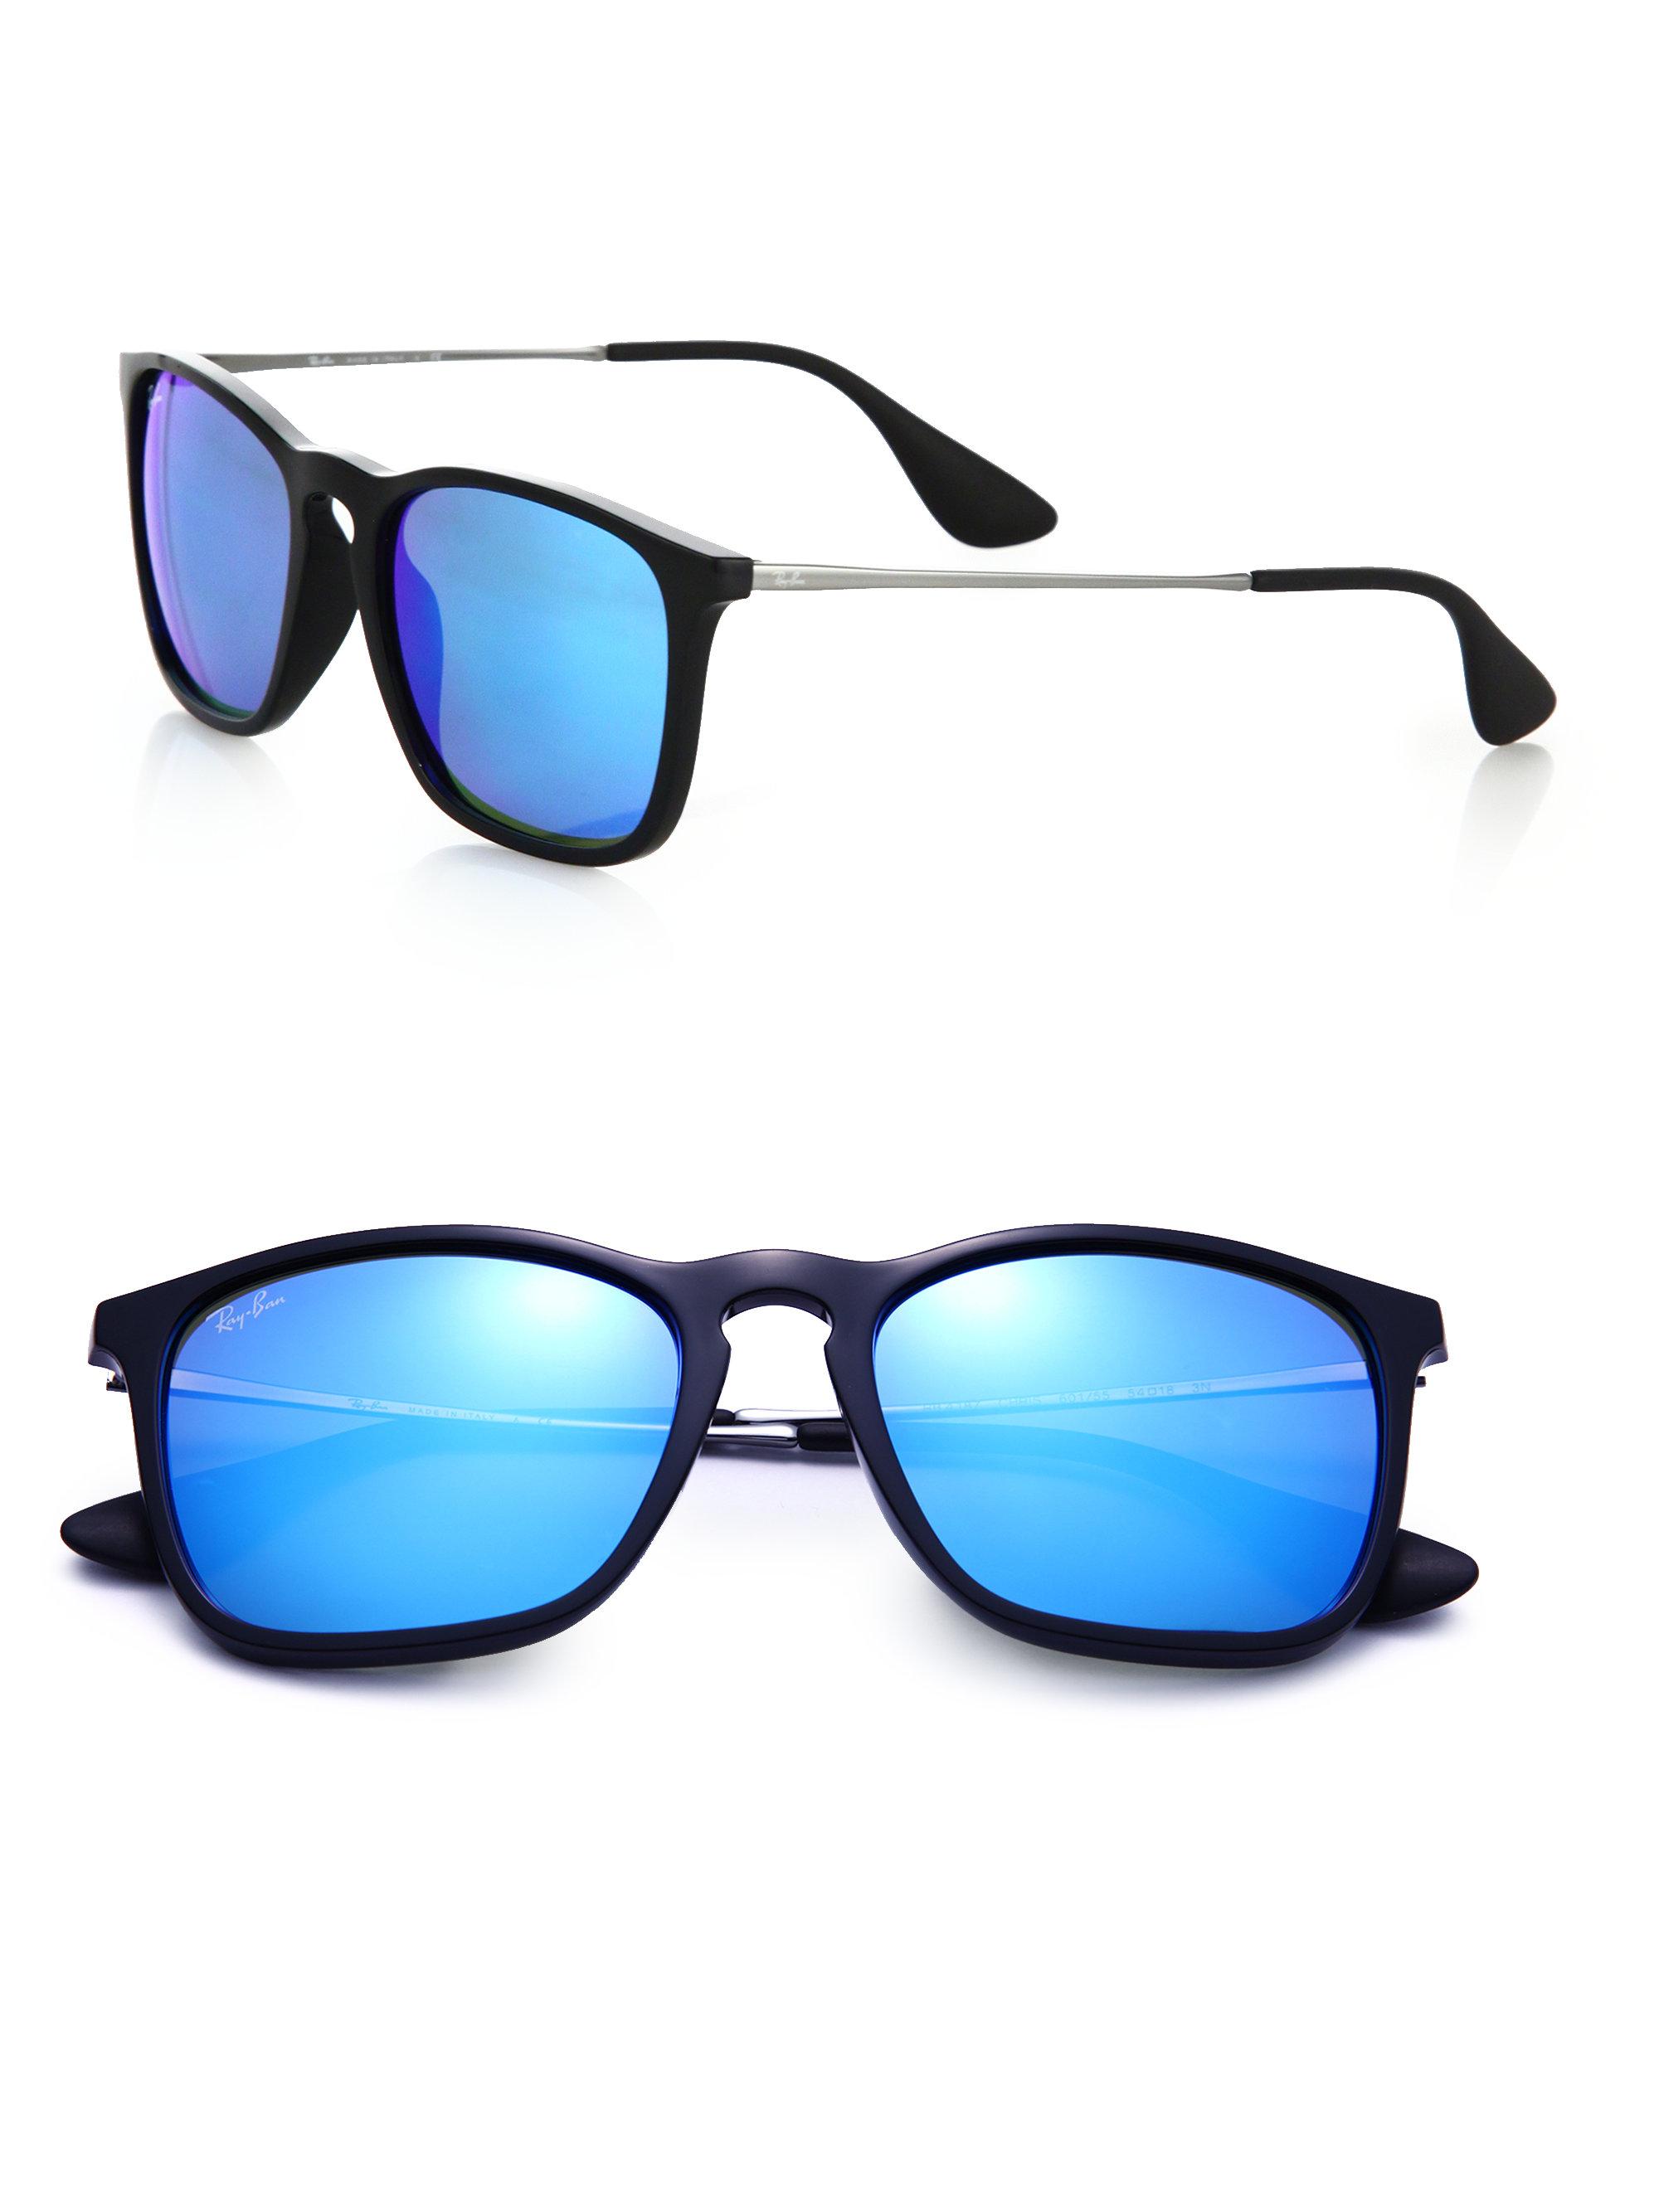 ray ban sunglasses blue white